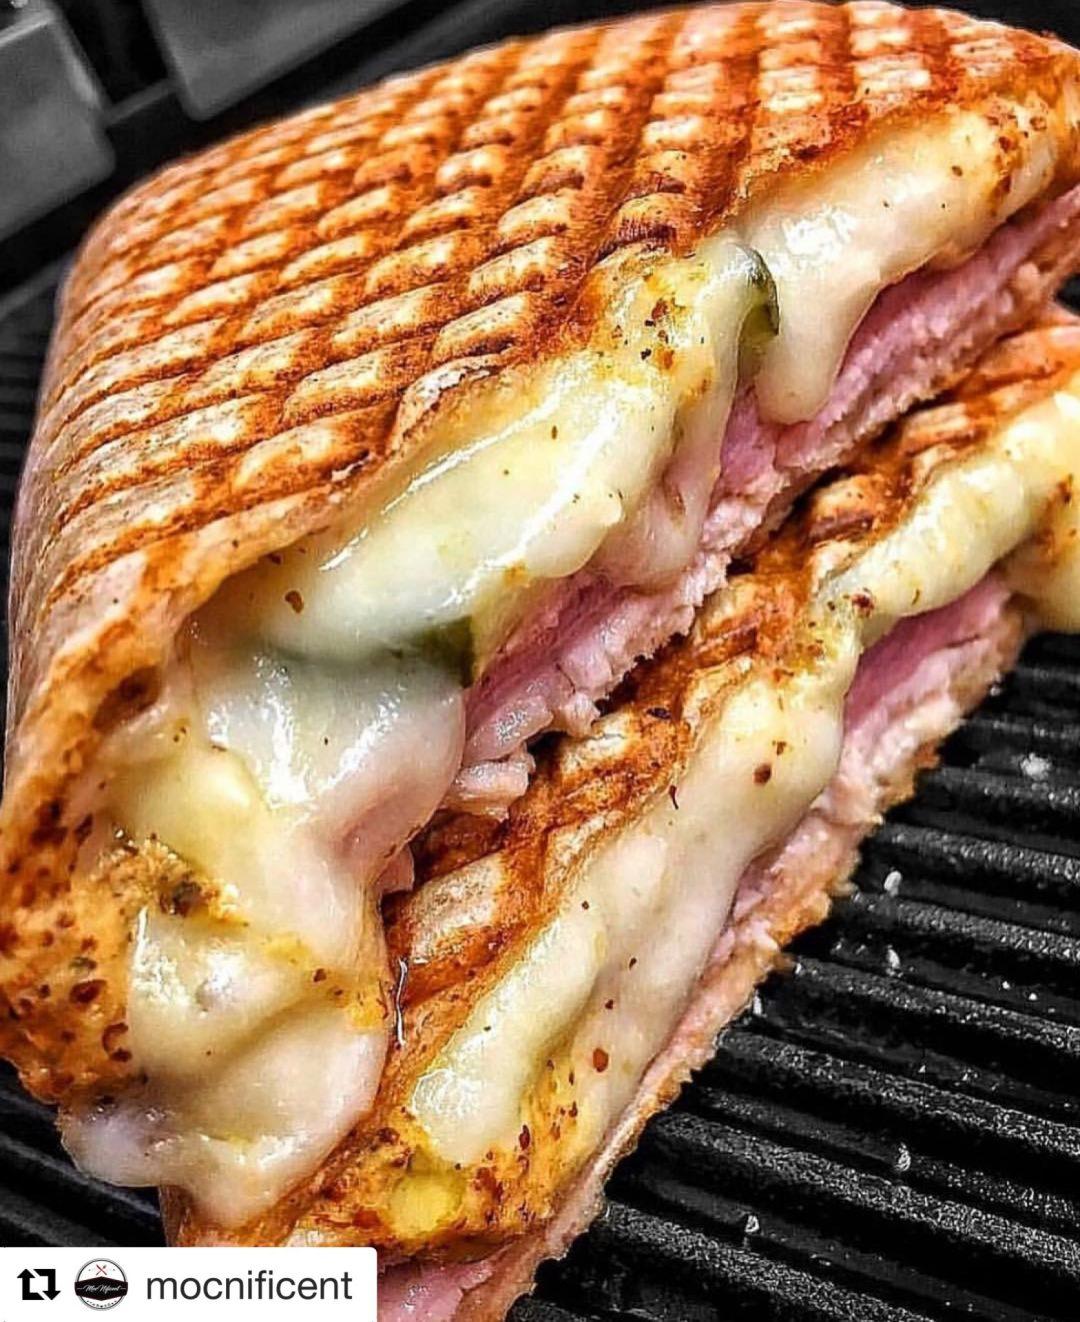 Sandwich Madness: Mocnificent